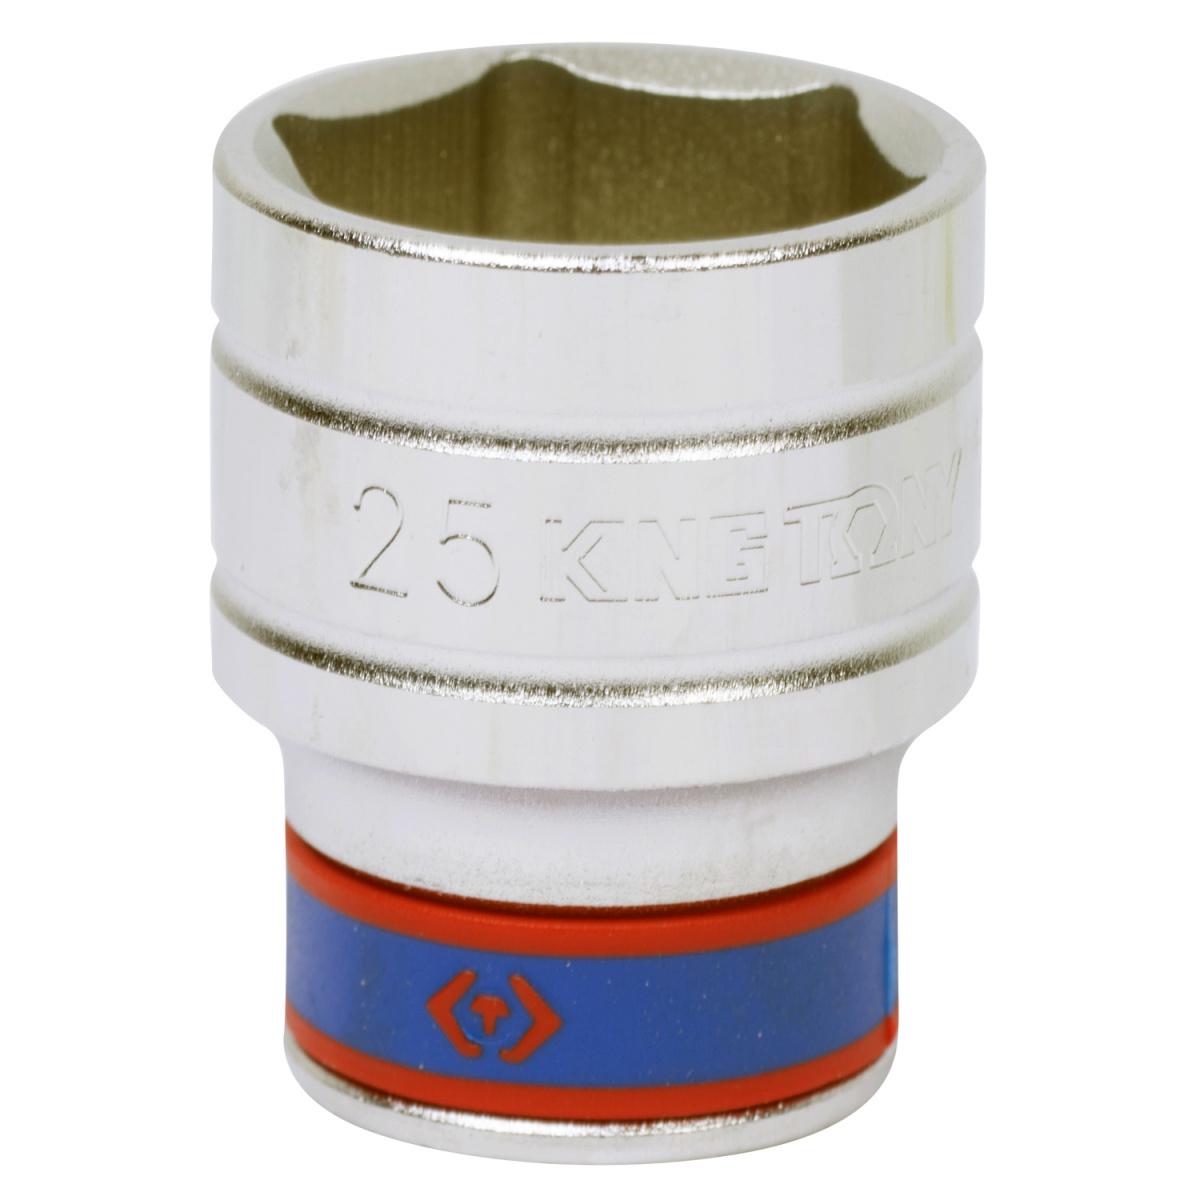 "Головка торцевая стандартная шестигранная 1/2"", 25 мм KING TONY 433525M"